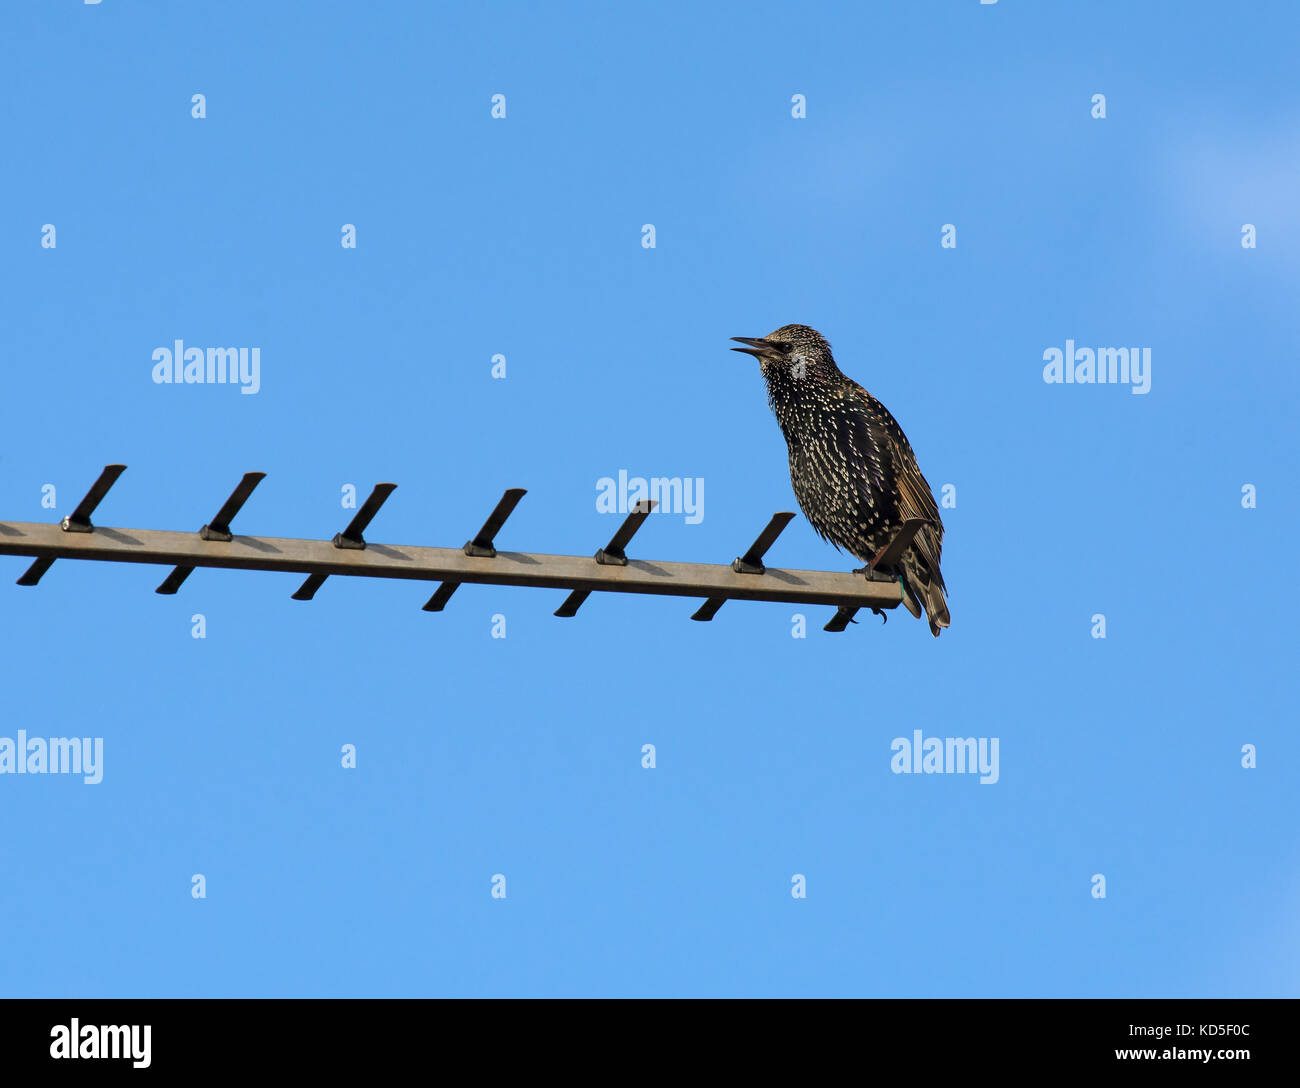 Common Starling, sturnus vulgaris, perched on television aerial, Dorset, UK - Stock Image